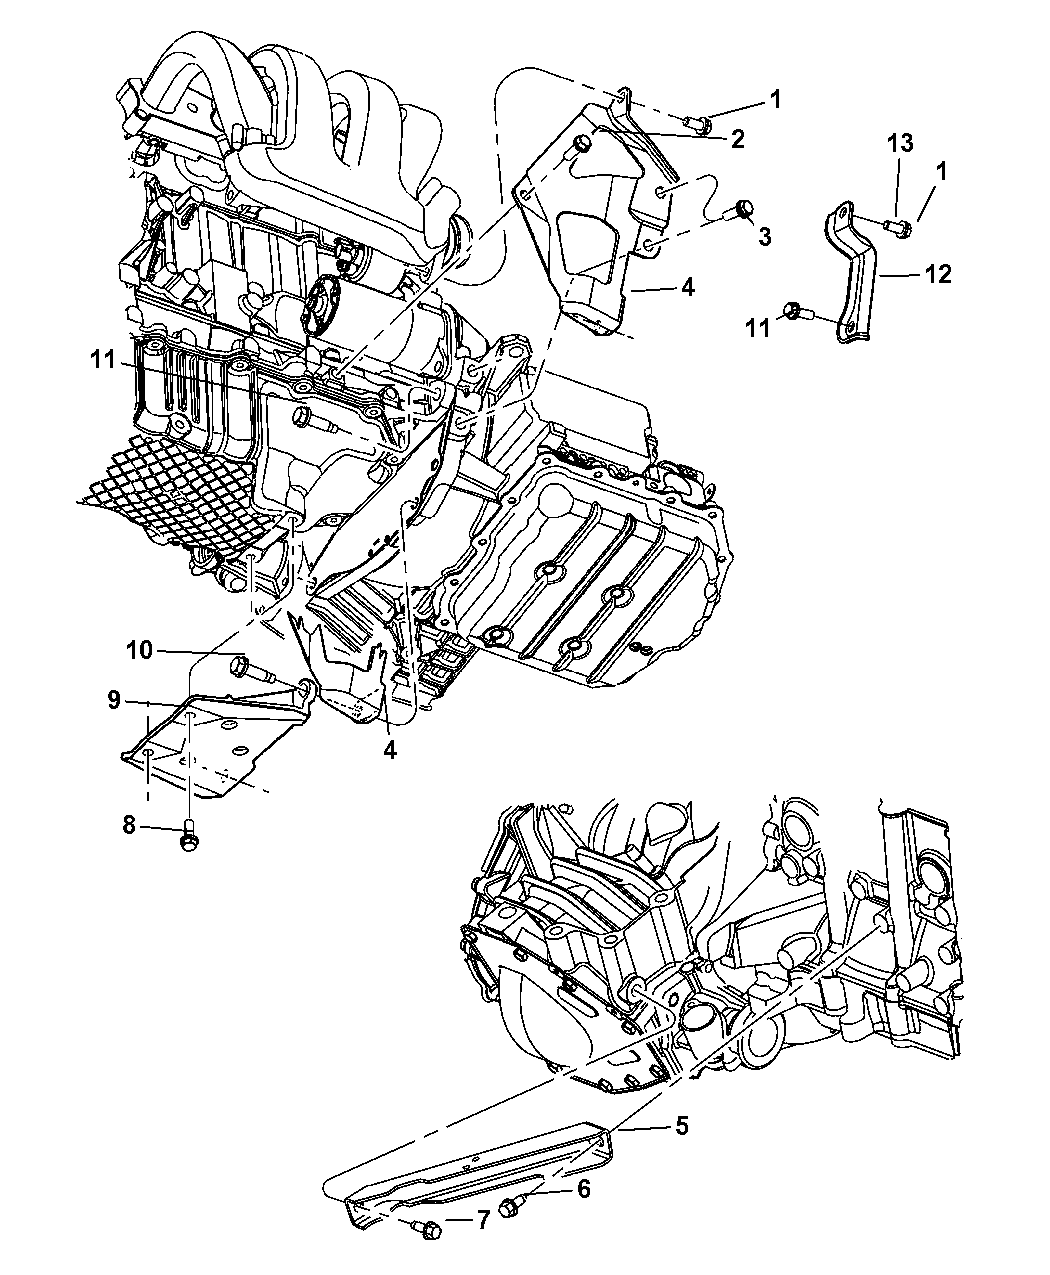 95 2003 Neon Engine Picture Of Dodge Srt 4 Turbo Fwd Wiring Strut